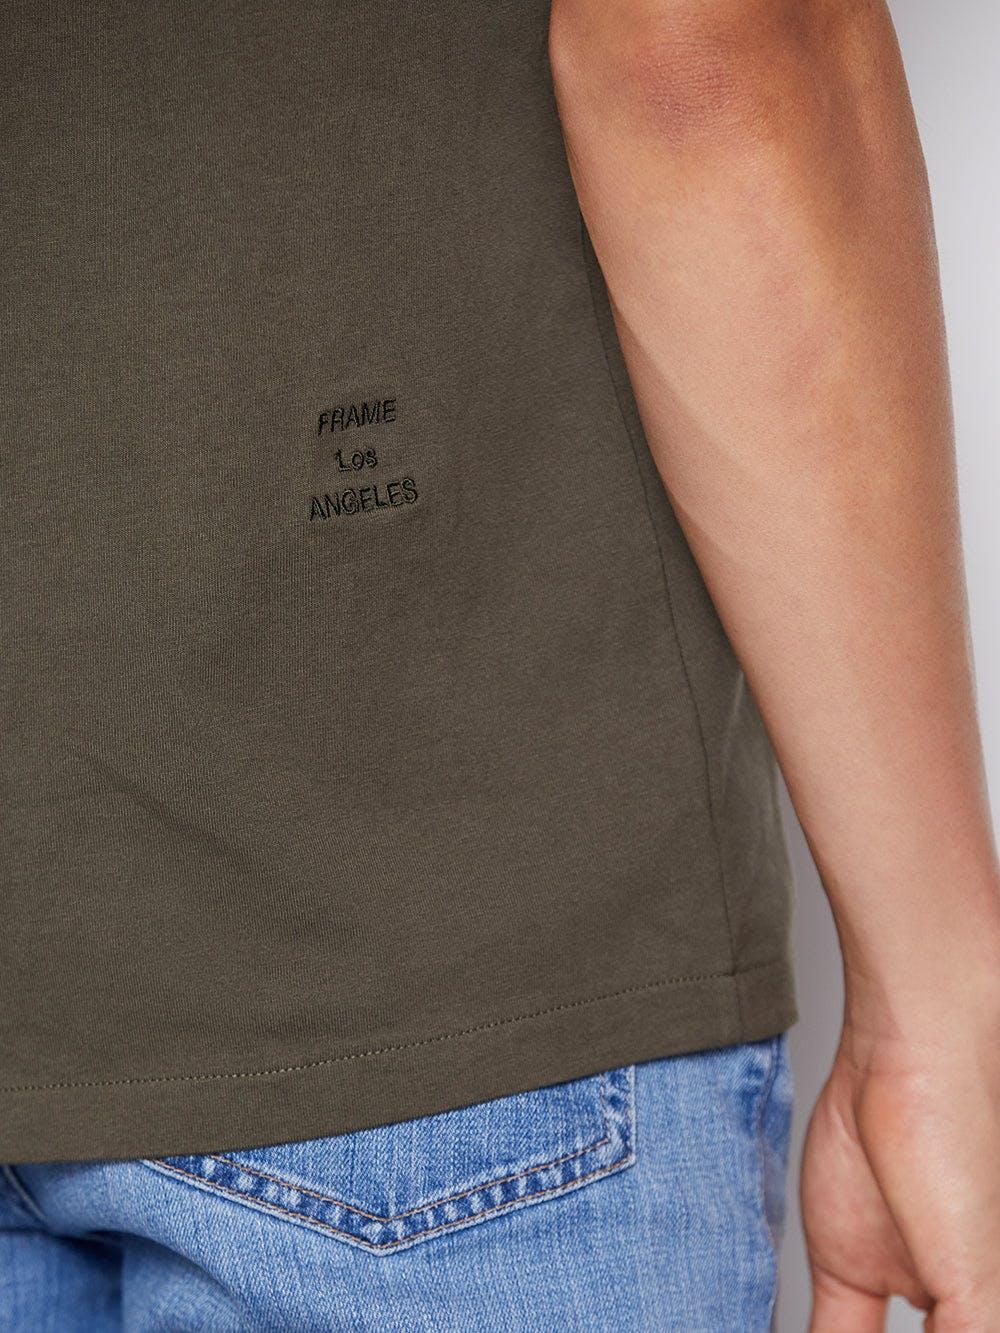 shirt detail view alt:hover